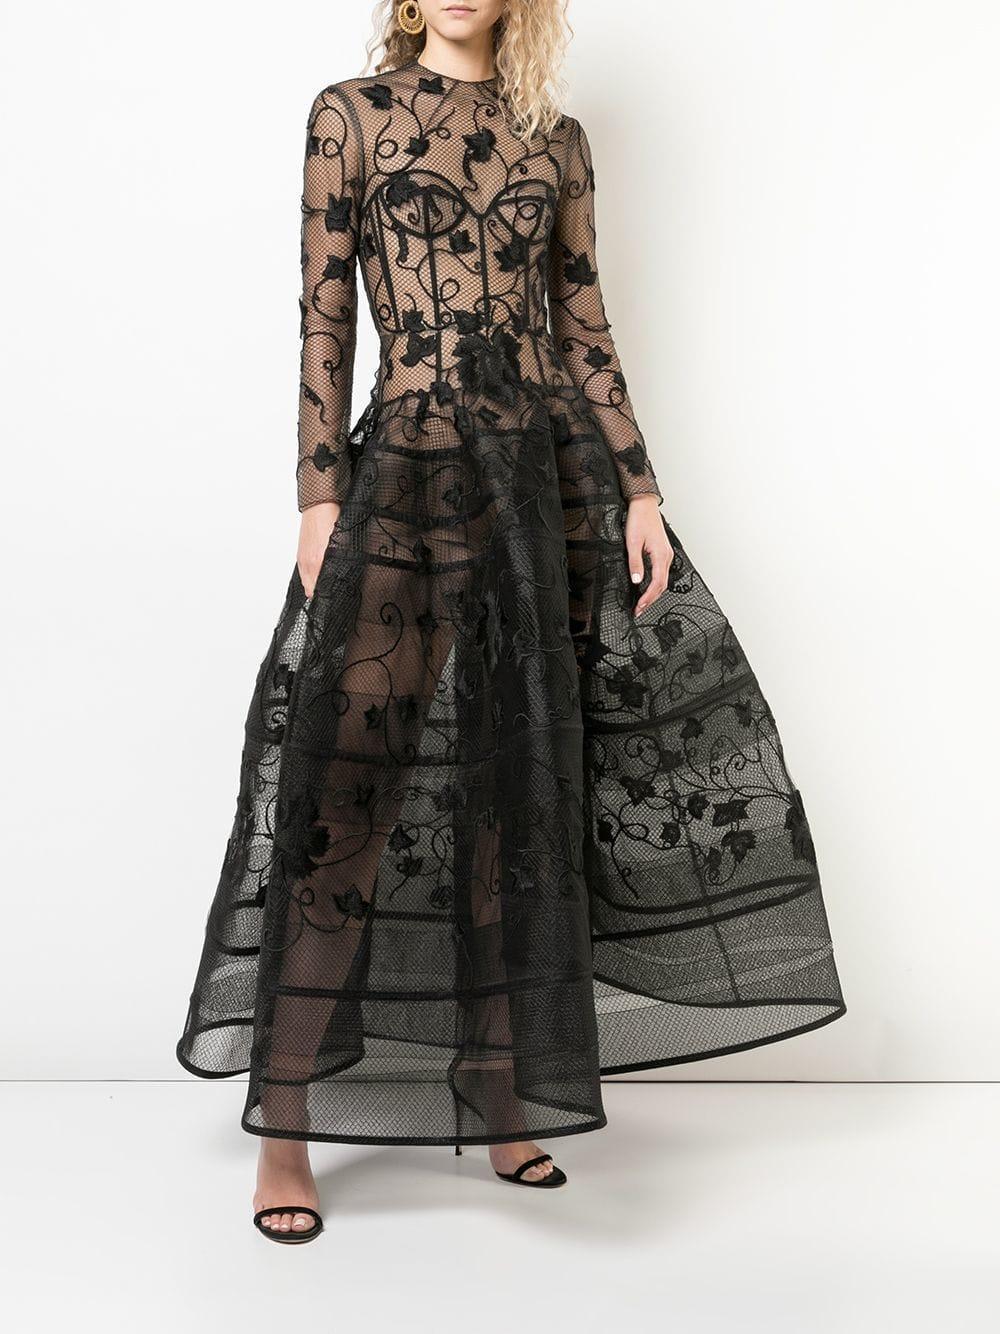 e7d0099a785 Lyst - Oscar de la Renta Floral Embroidered Gown in Black - Save 29%